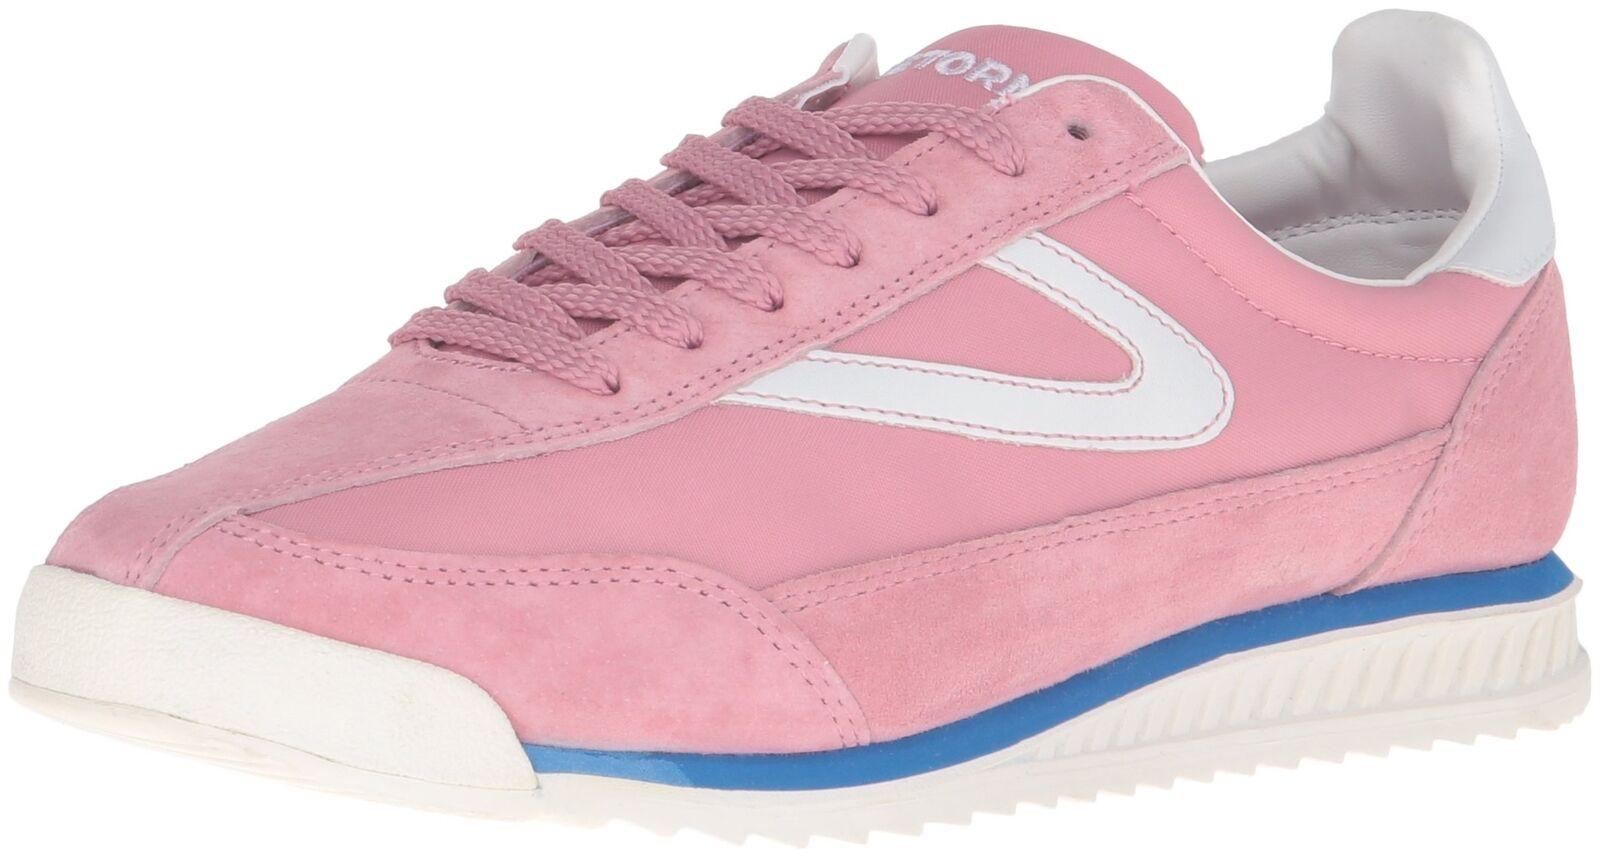 Tretorn Women's Rawlins3 Fashion Sneaker, Pink/Pink, 6.5 M US